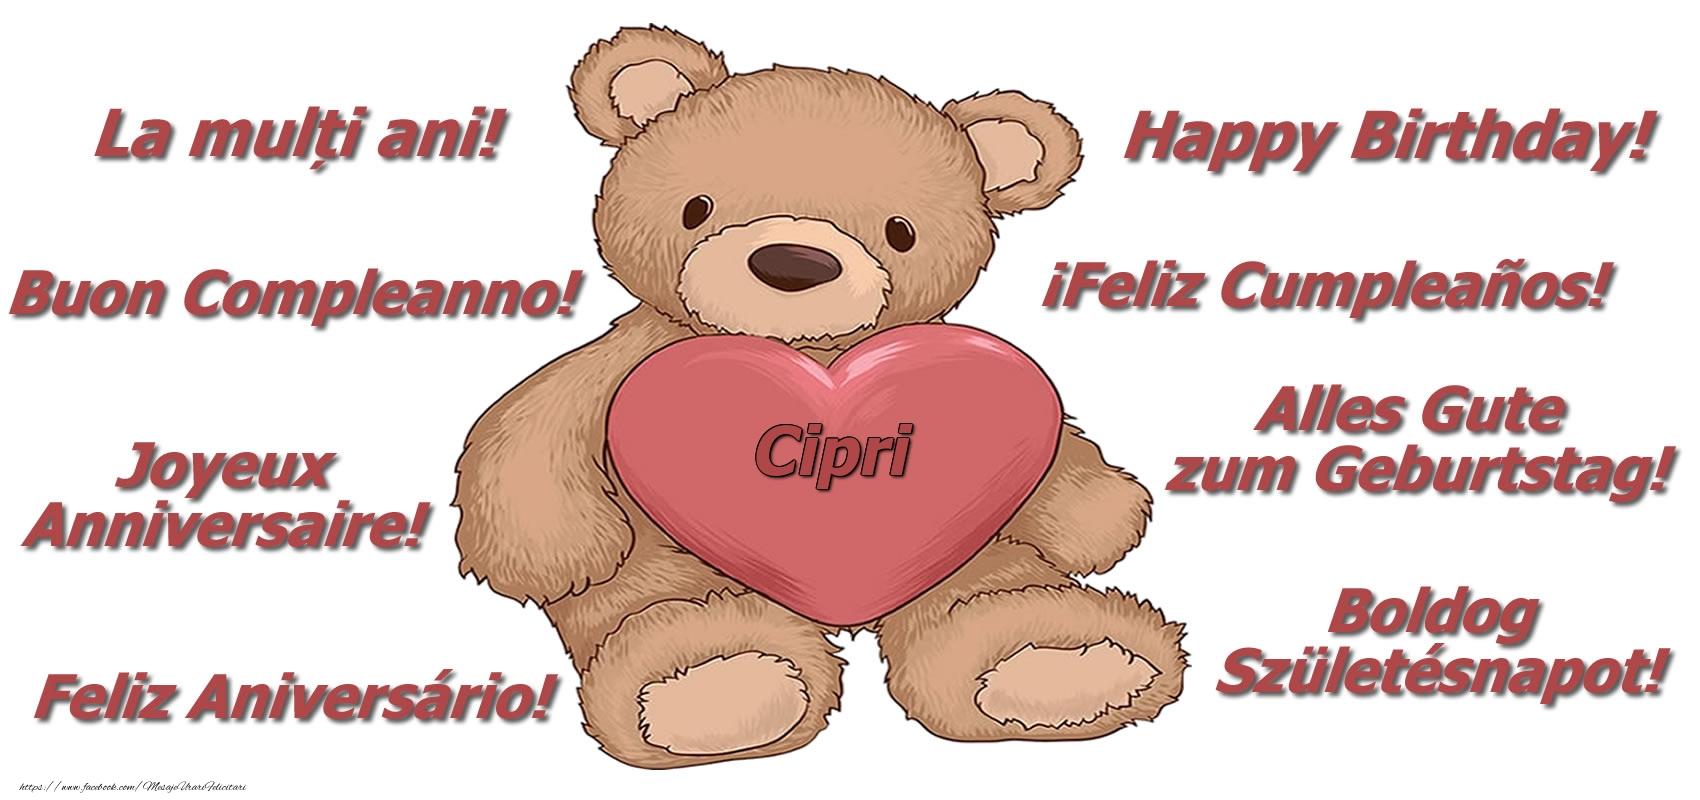 Felicitari de zi de nastere - La multi ani Cipri! - Ursulet